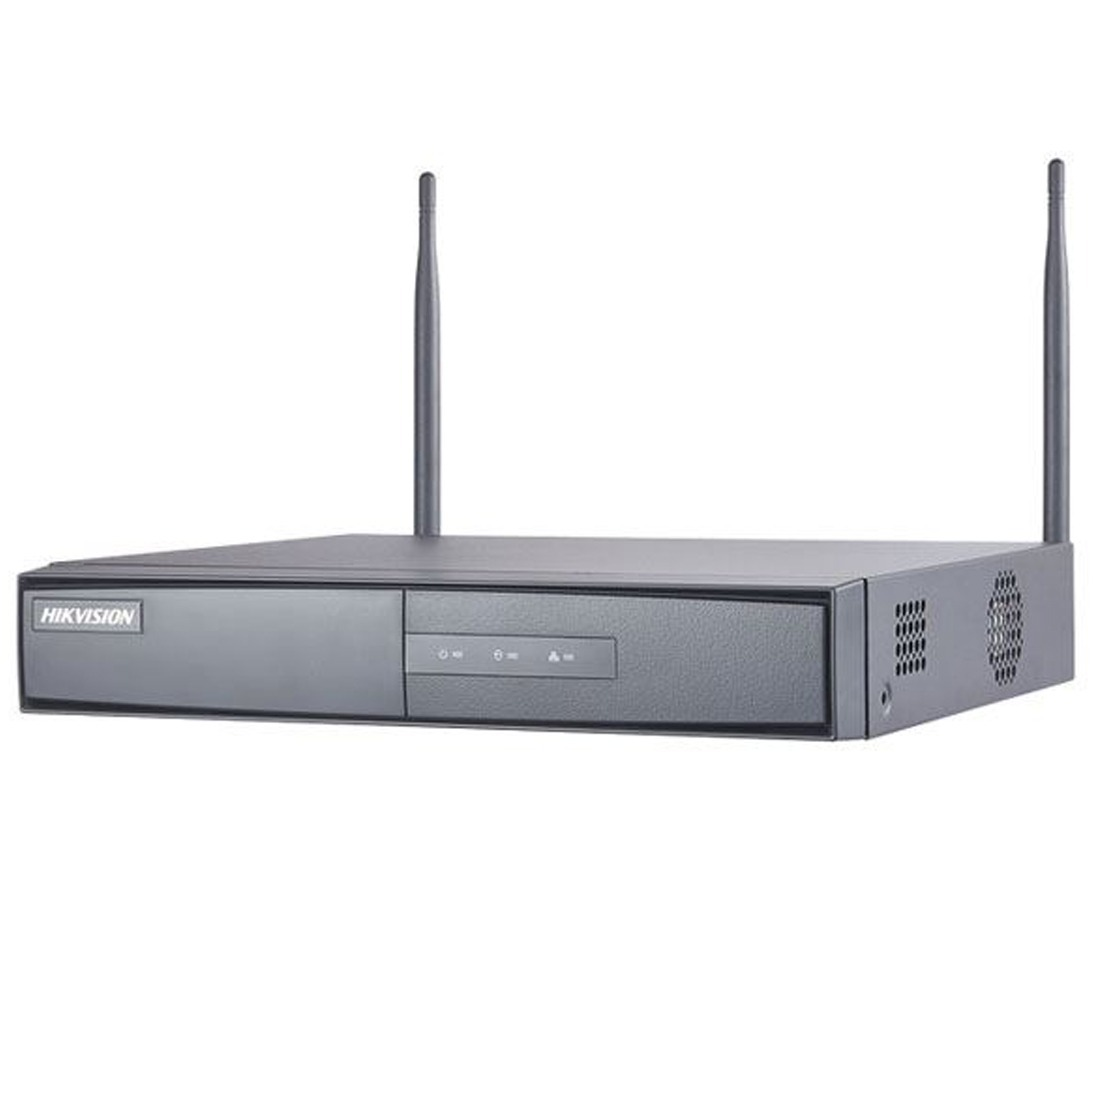 kit-de-monitoramento-wifi-nvr-04-cmeras-hikvision-nk4w1-D_NQ_NP_773781-MLB27984167151_082018-F